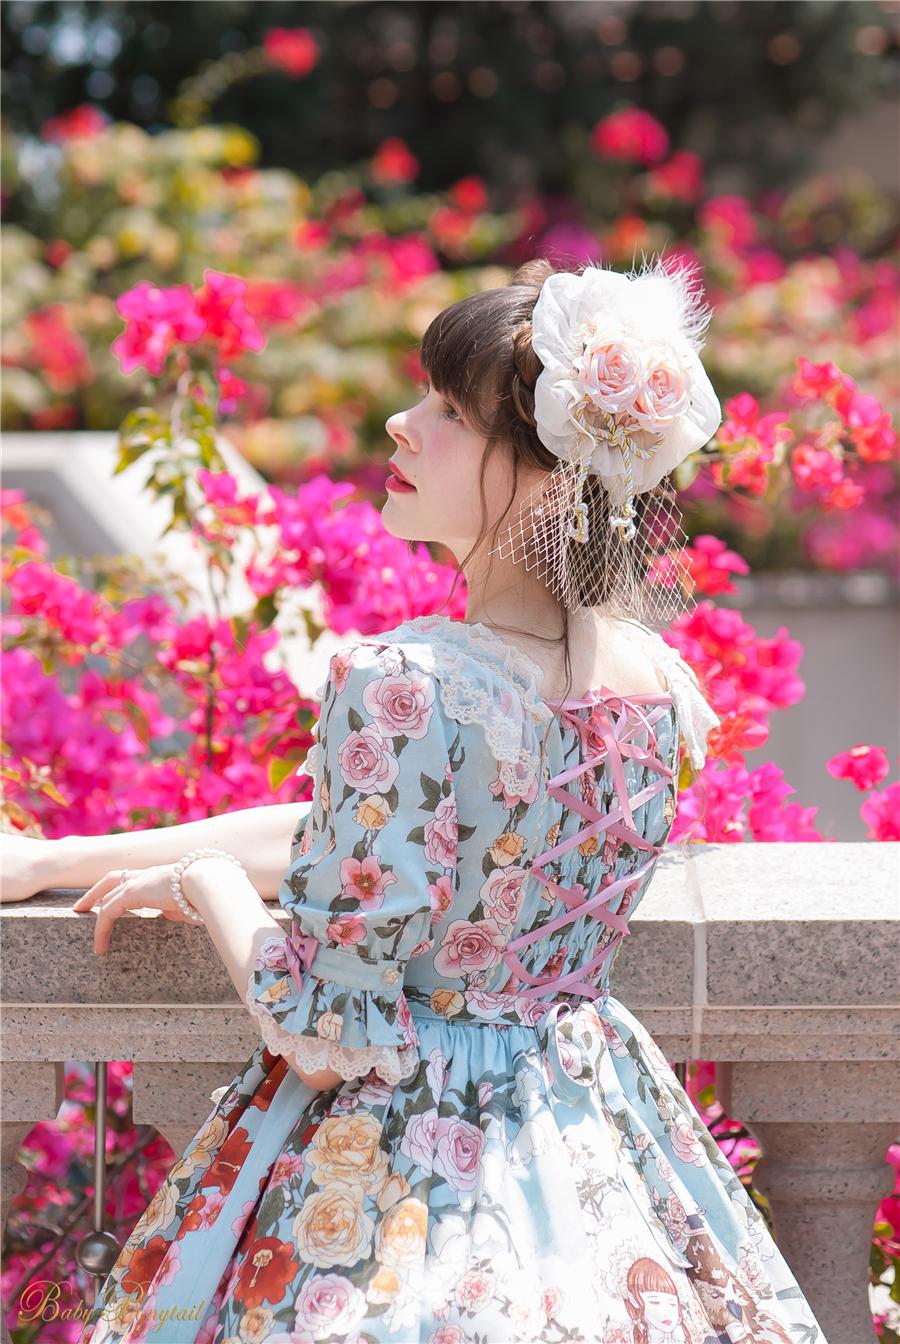 Baby Ponytail_Model Photo_Polly's Garden of Dreams_OP Lagoon Blue_Claudia_19.jpg